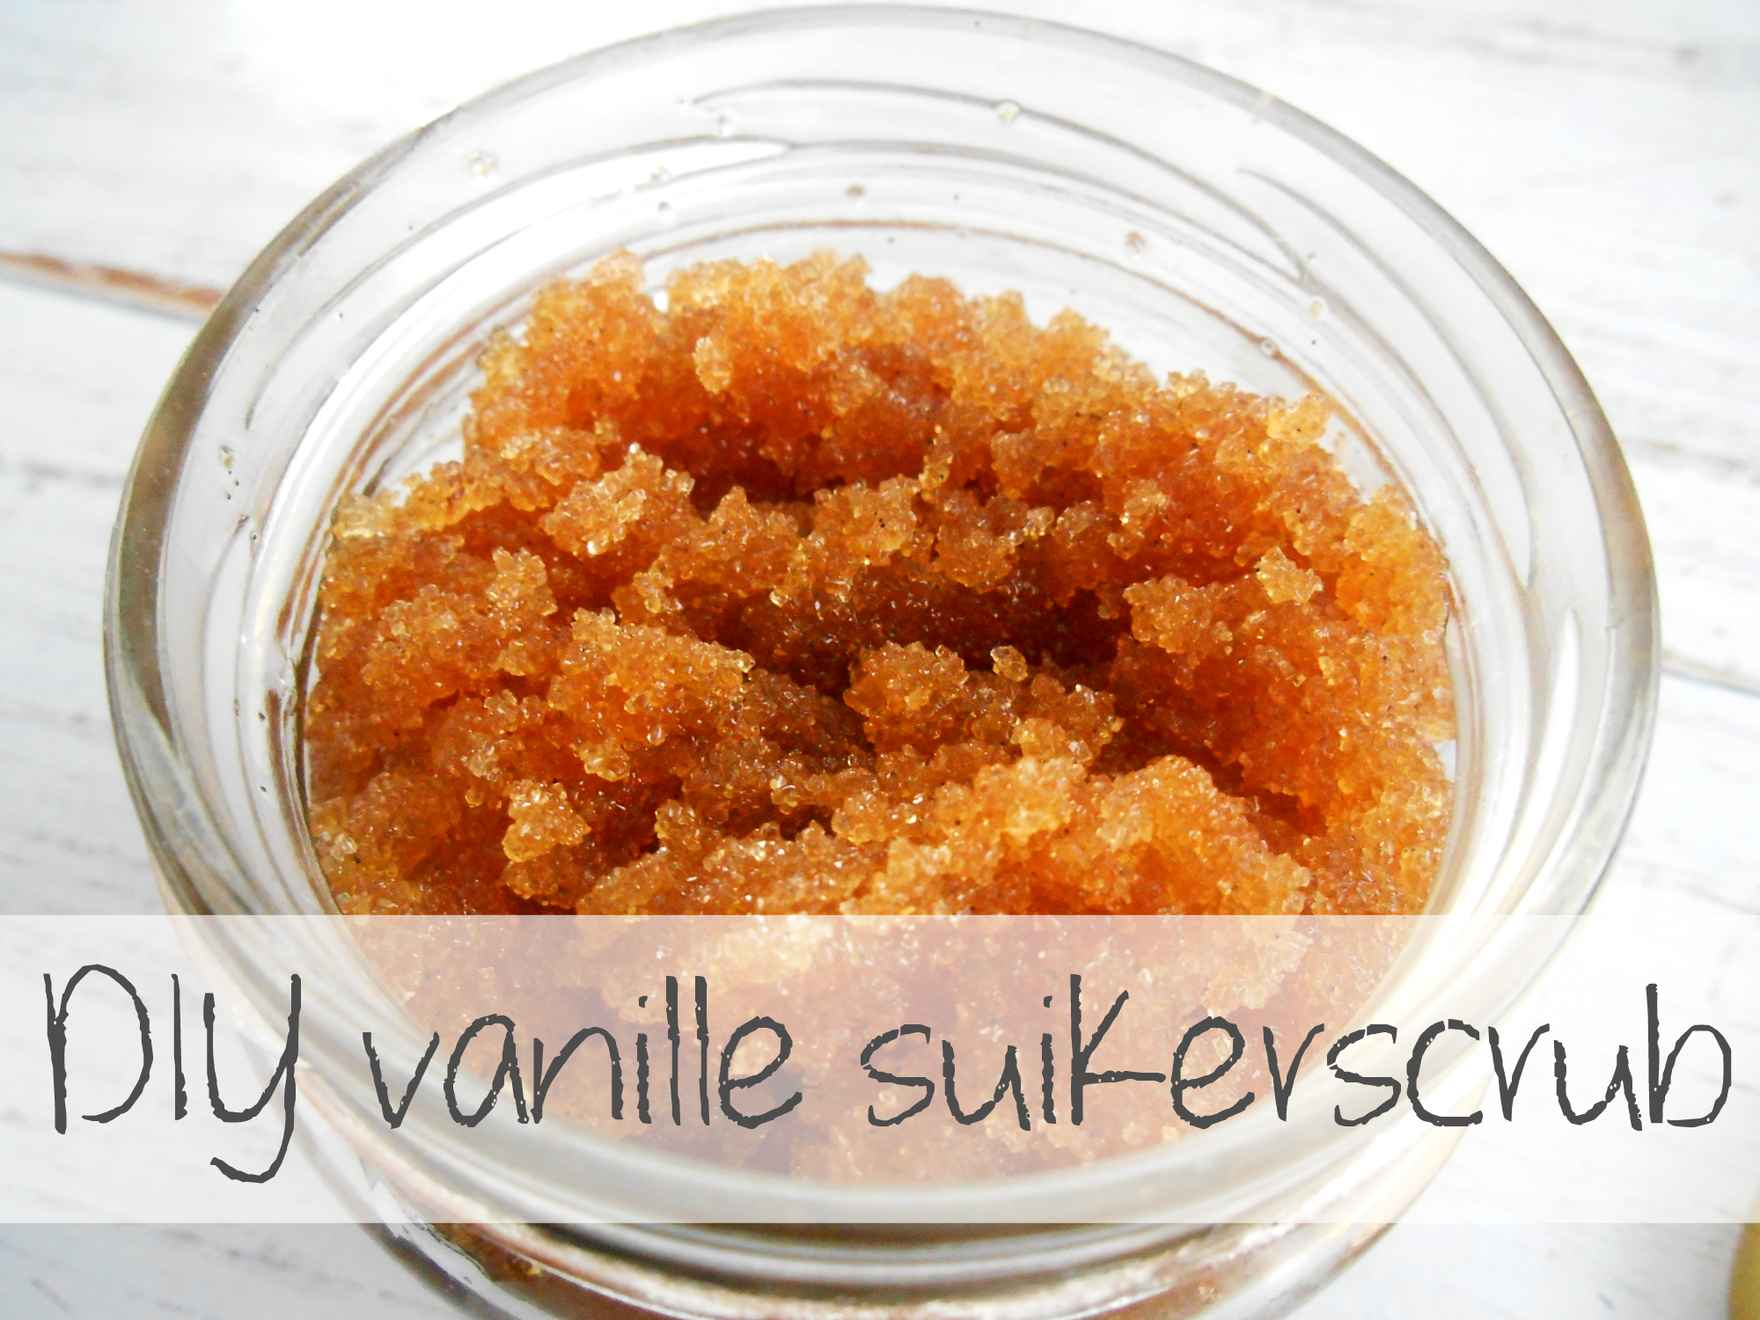 DIY-vanille-suikerscrub.jpg